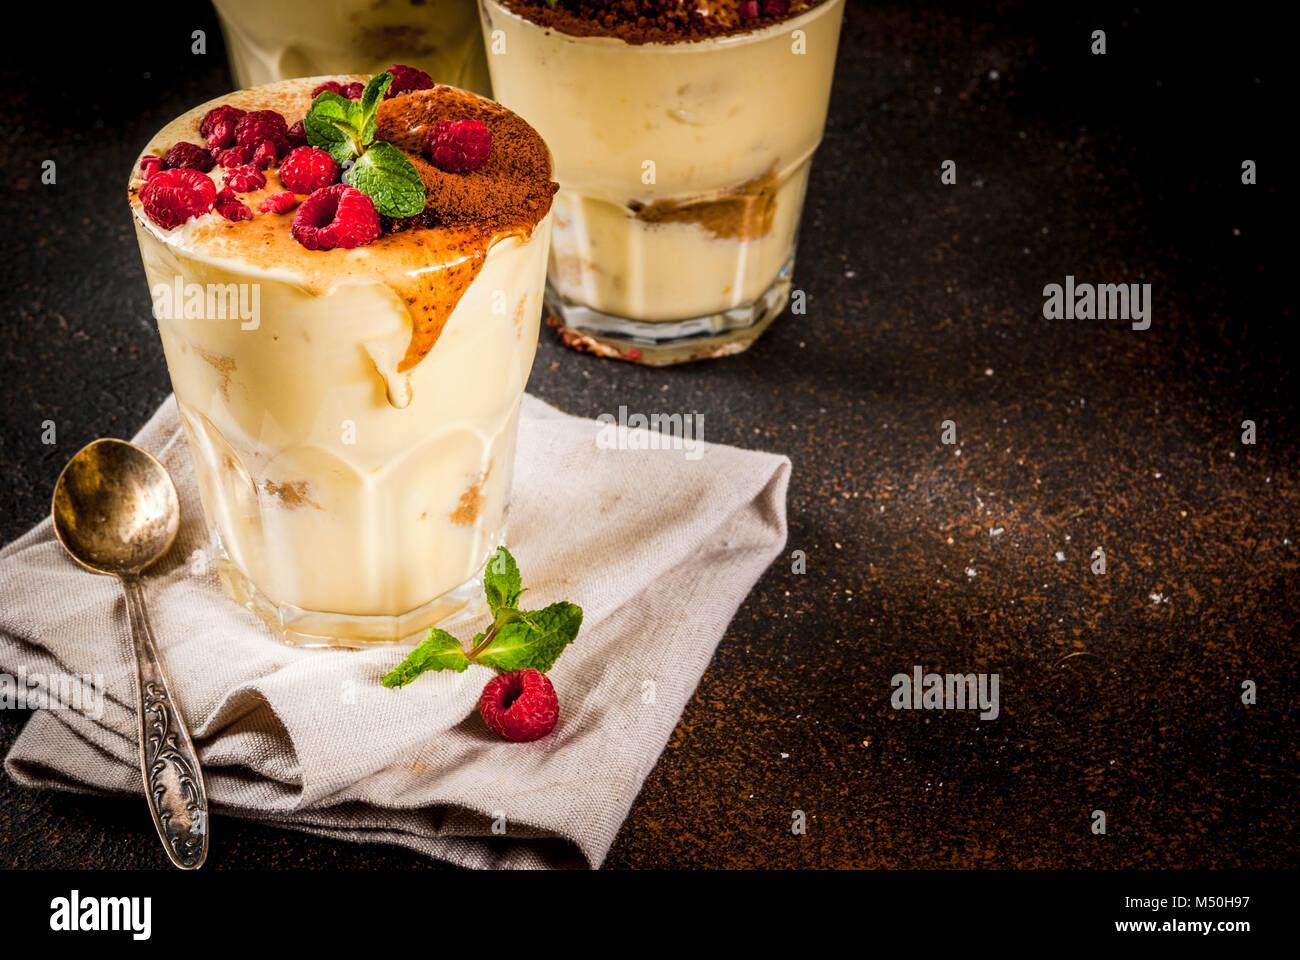 Three portioned glass with Italian dessert Tiramisu, with mint and raspberries, on dark rusty background.  Copy - Stock Image